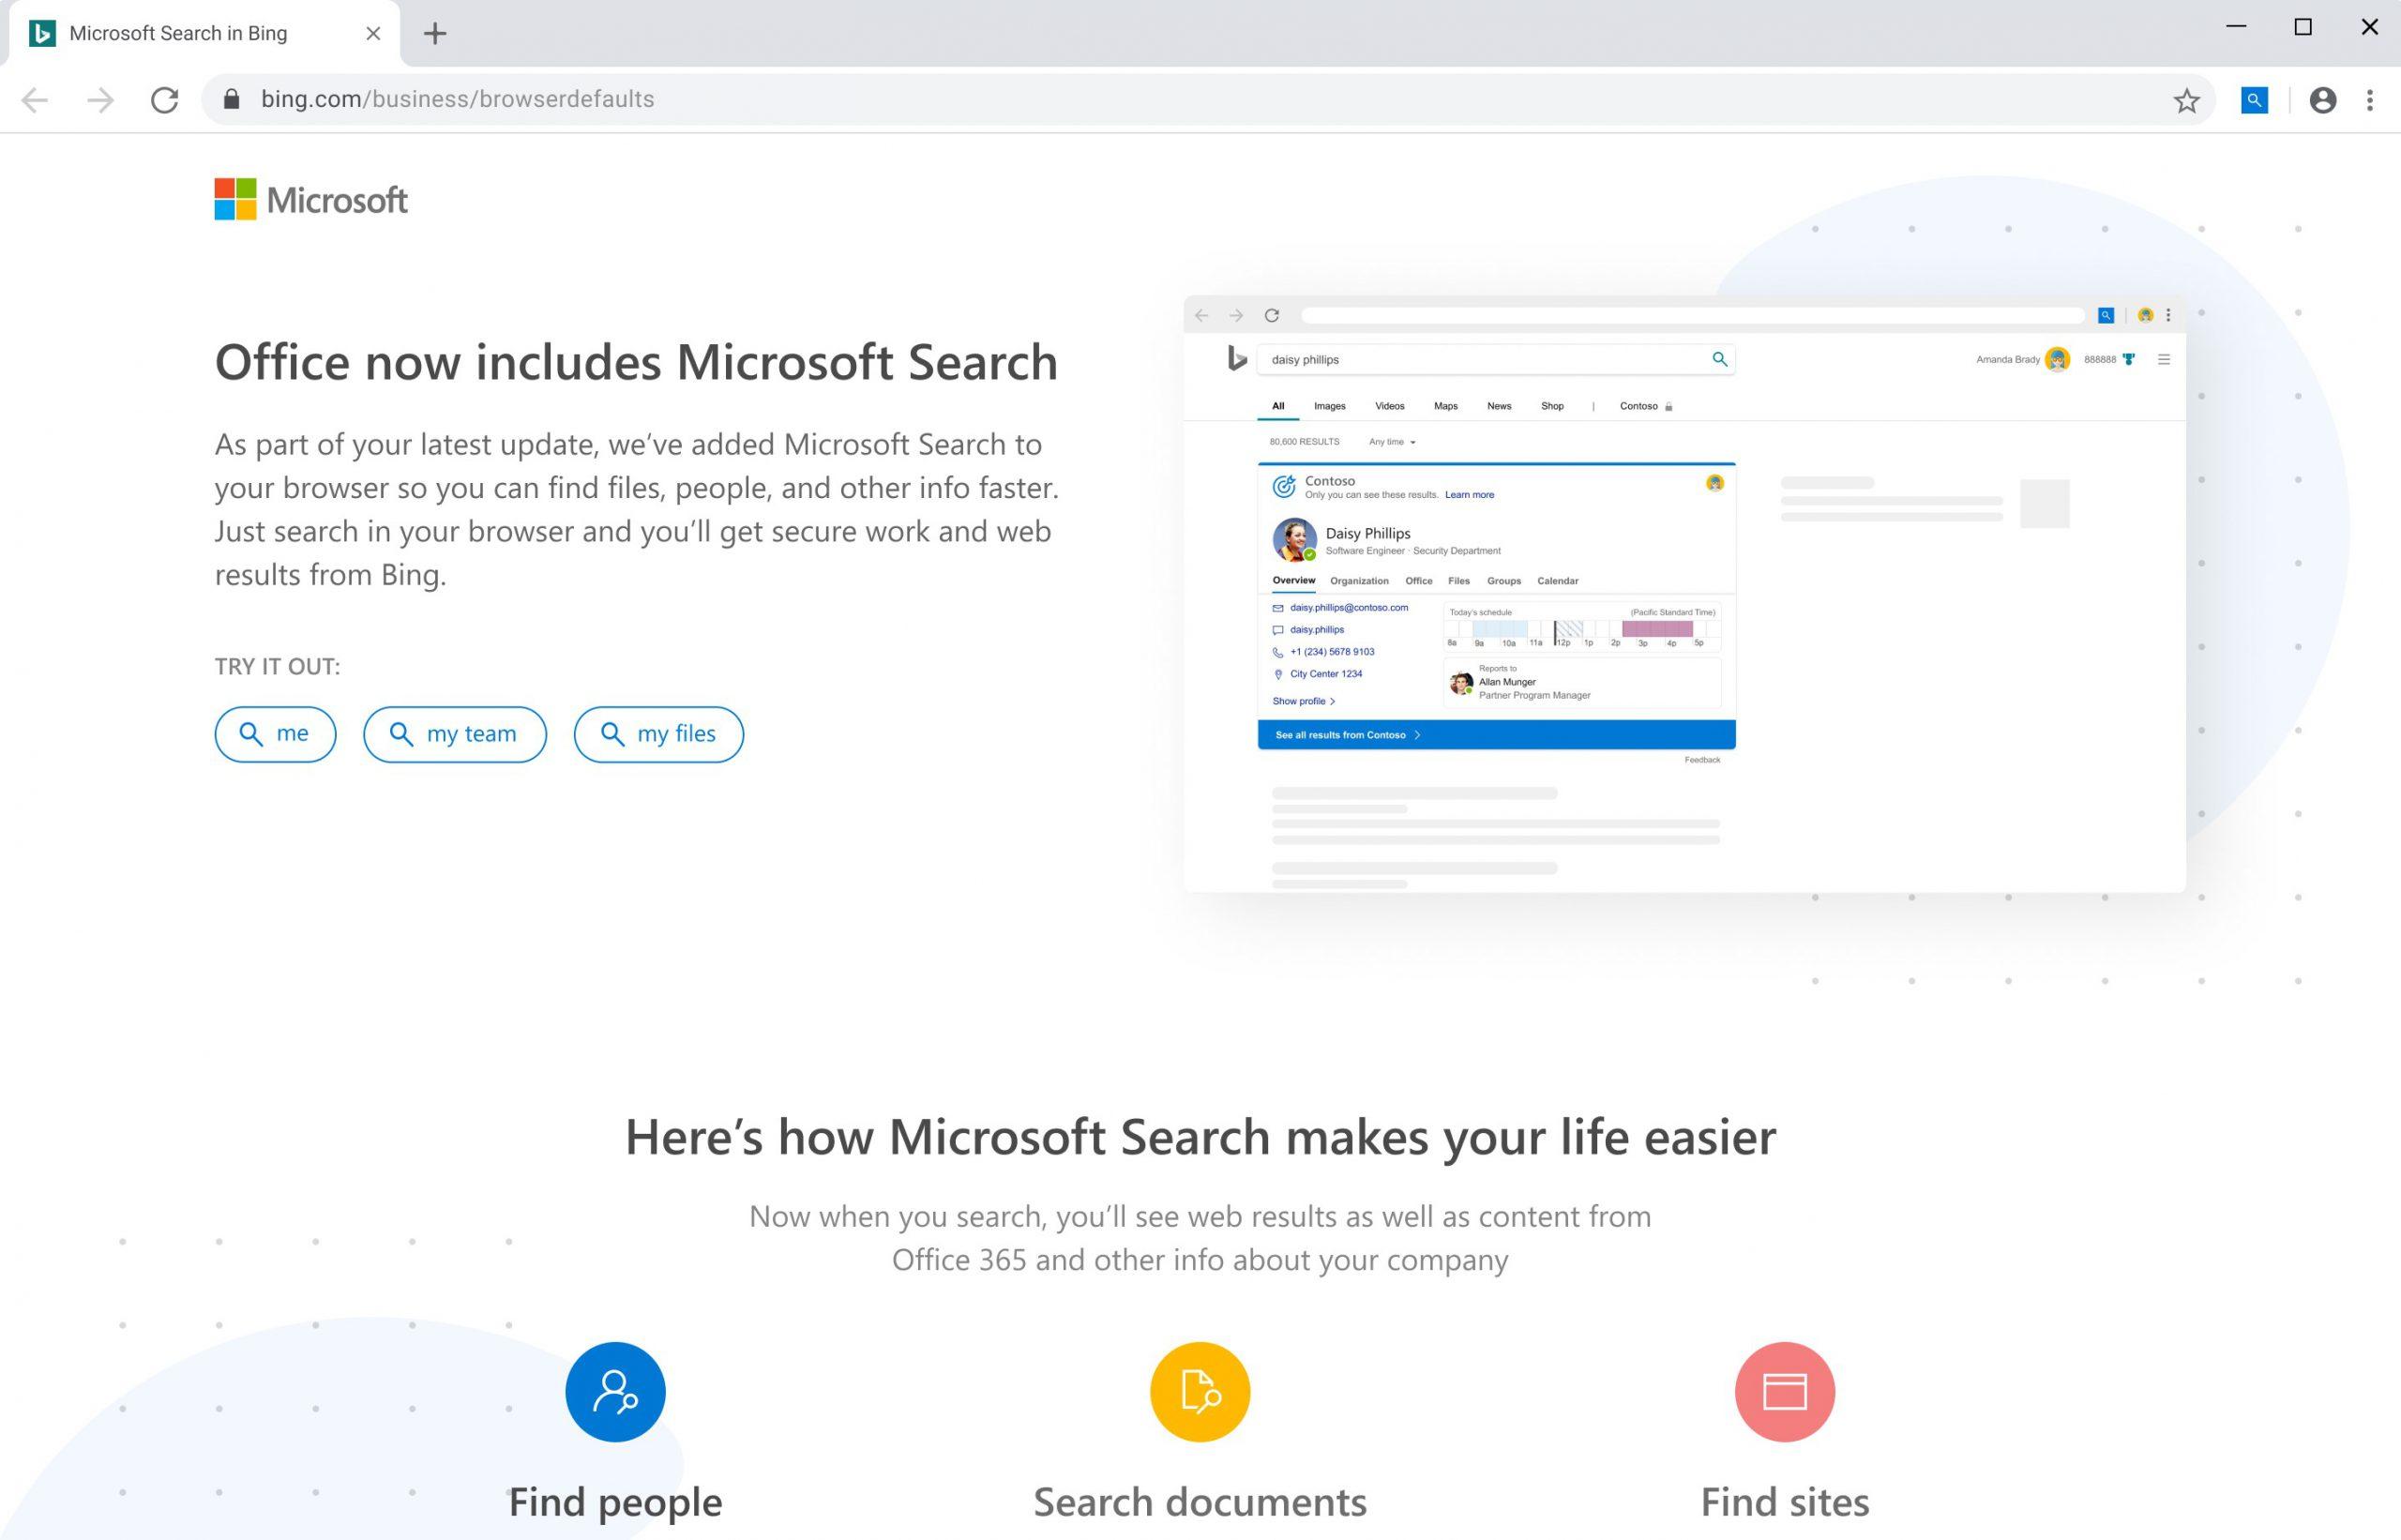 Ricerca Microsoft in Bing estensione per Google Chrome